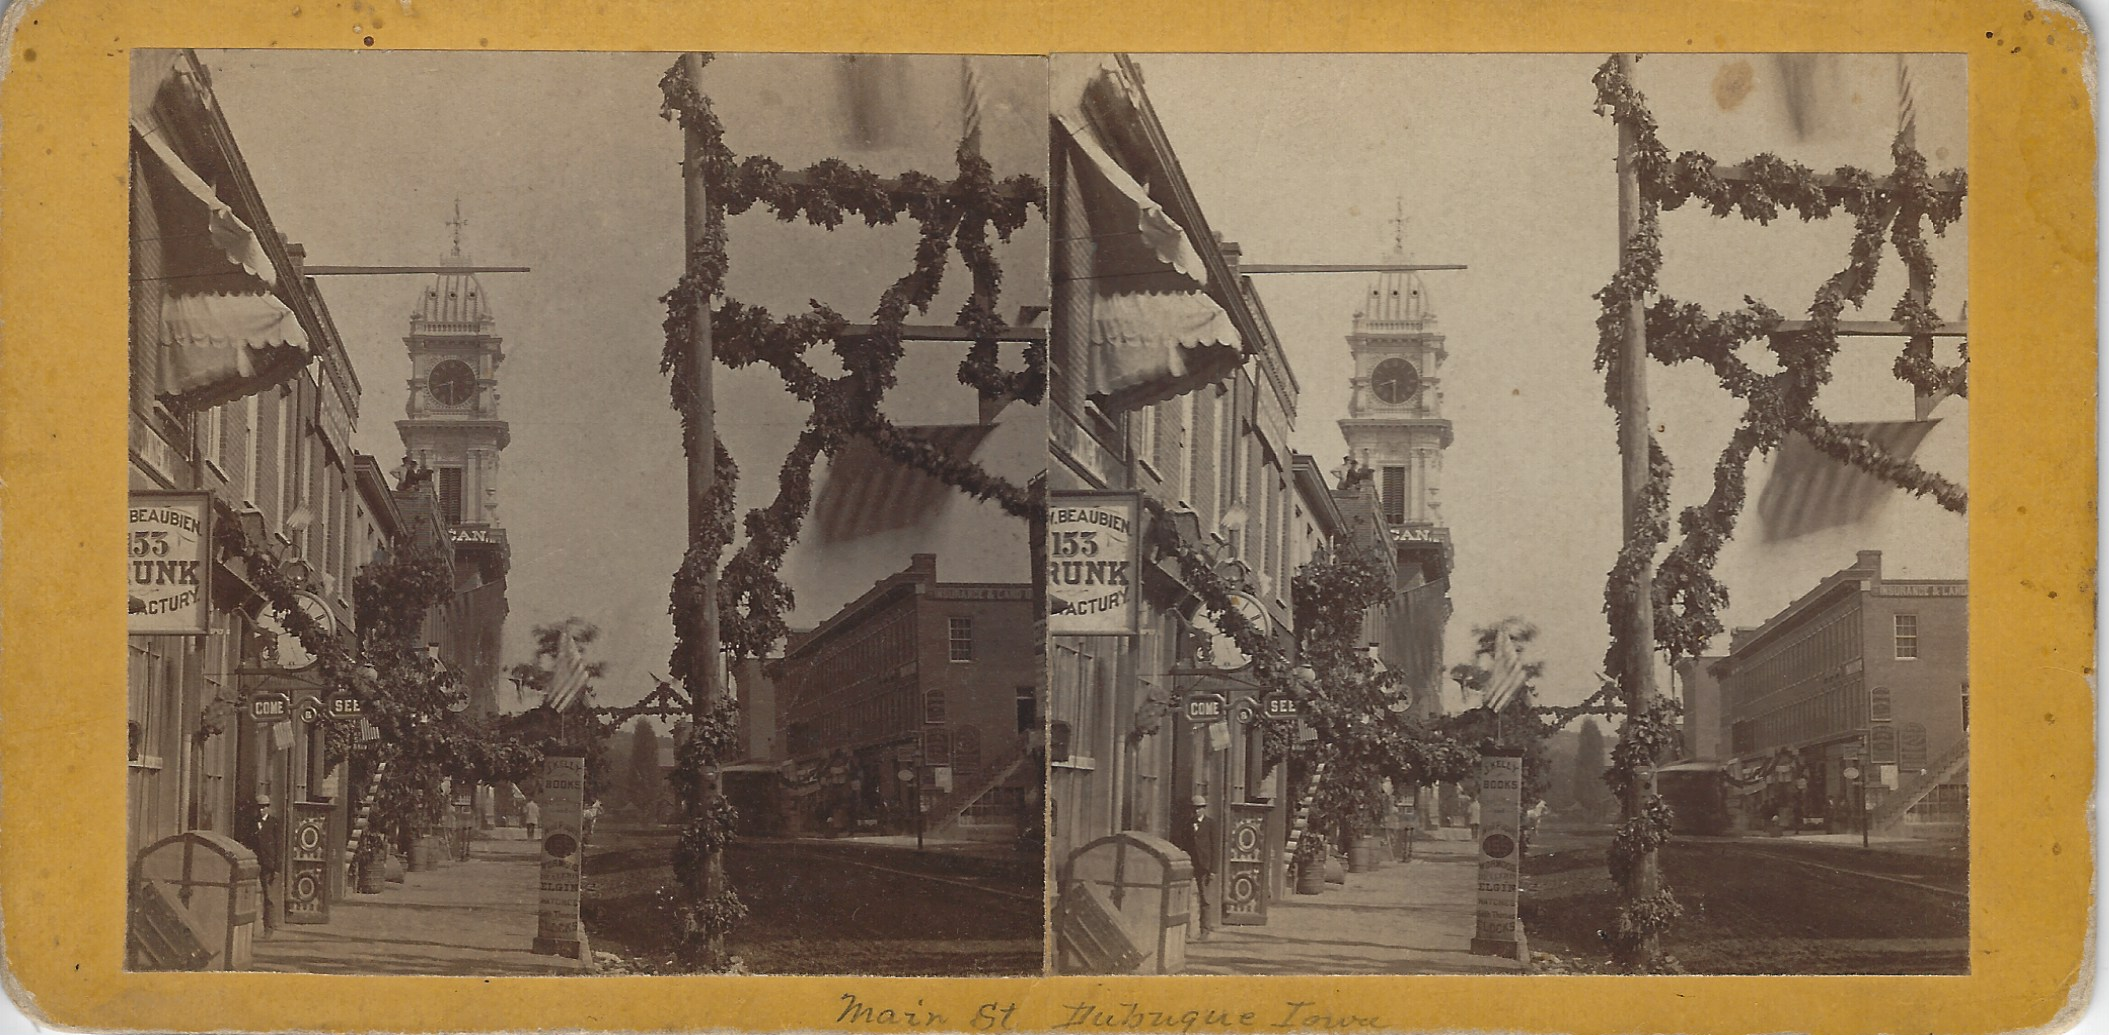 LJTP 100.247 - S. Root - New Town Clock - 1873